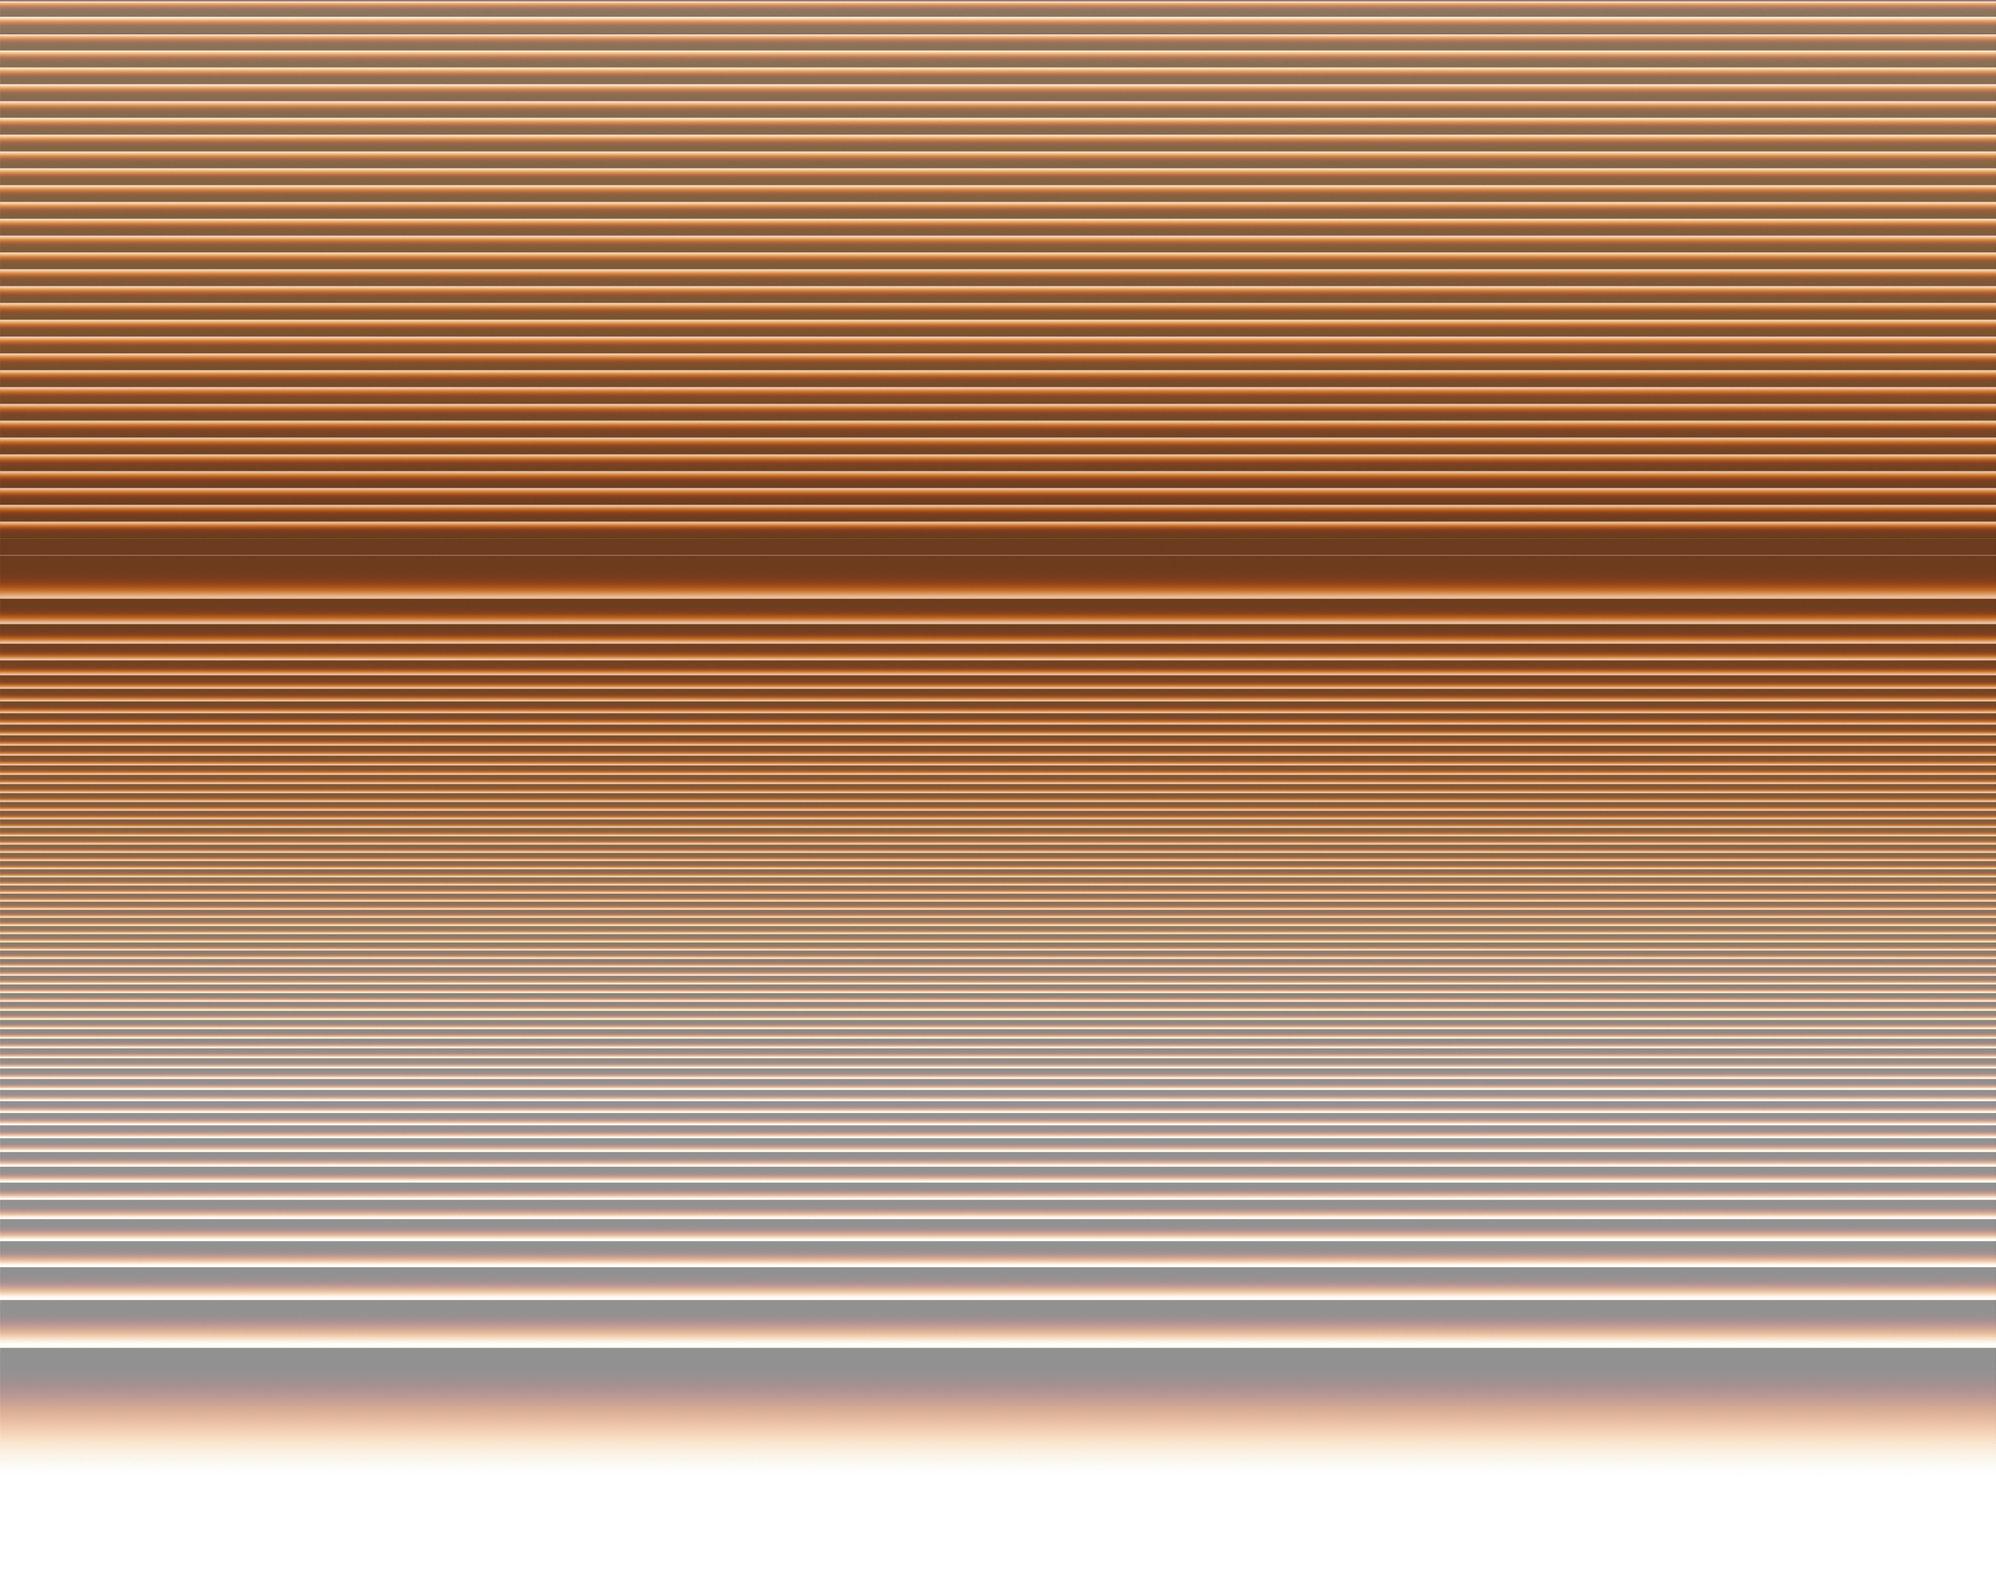 digital landscape-8.jpg